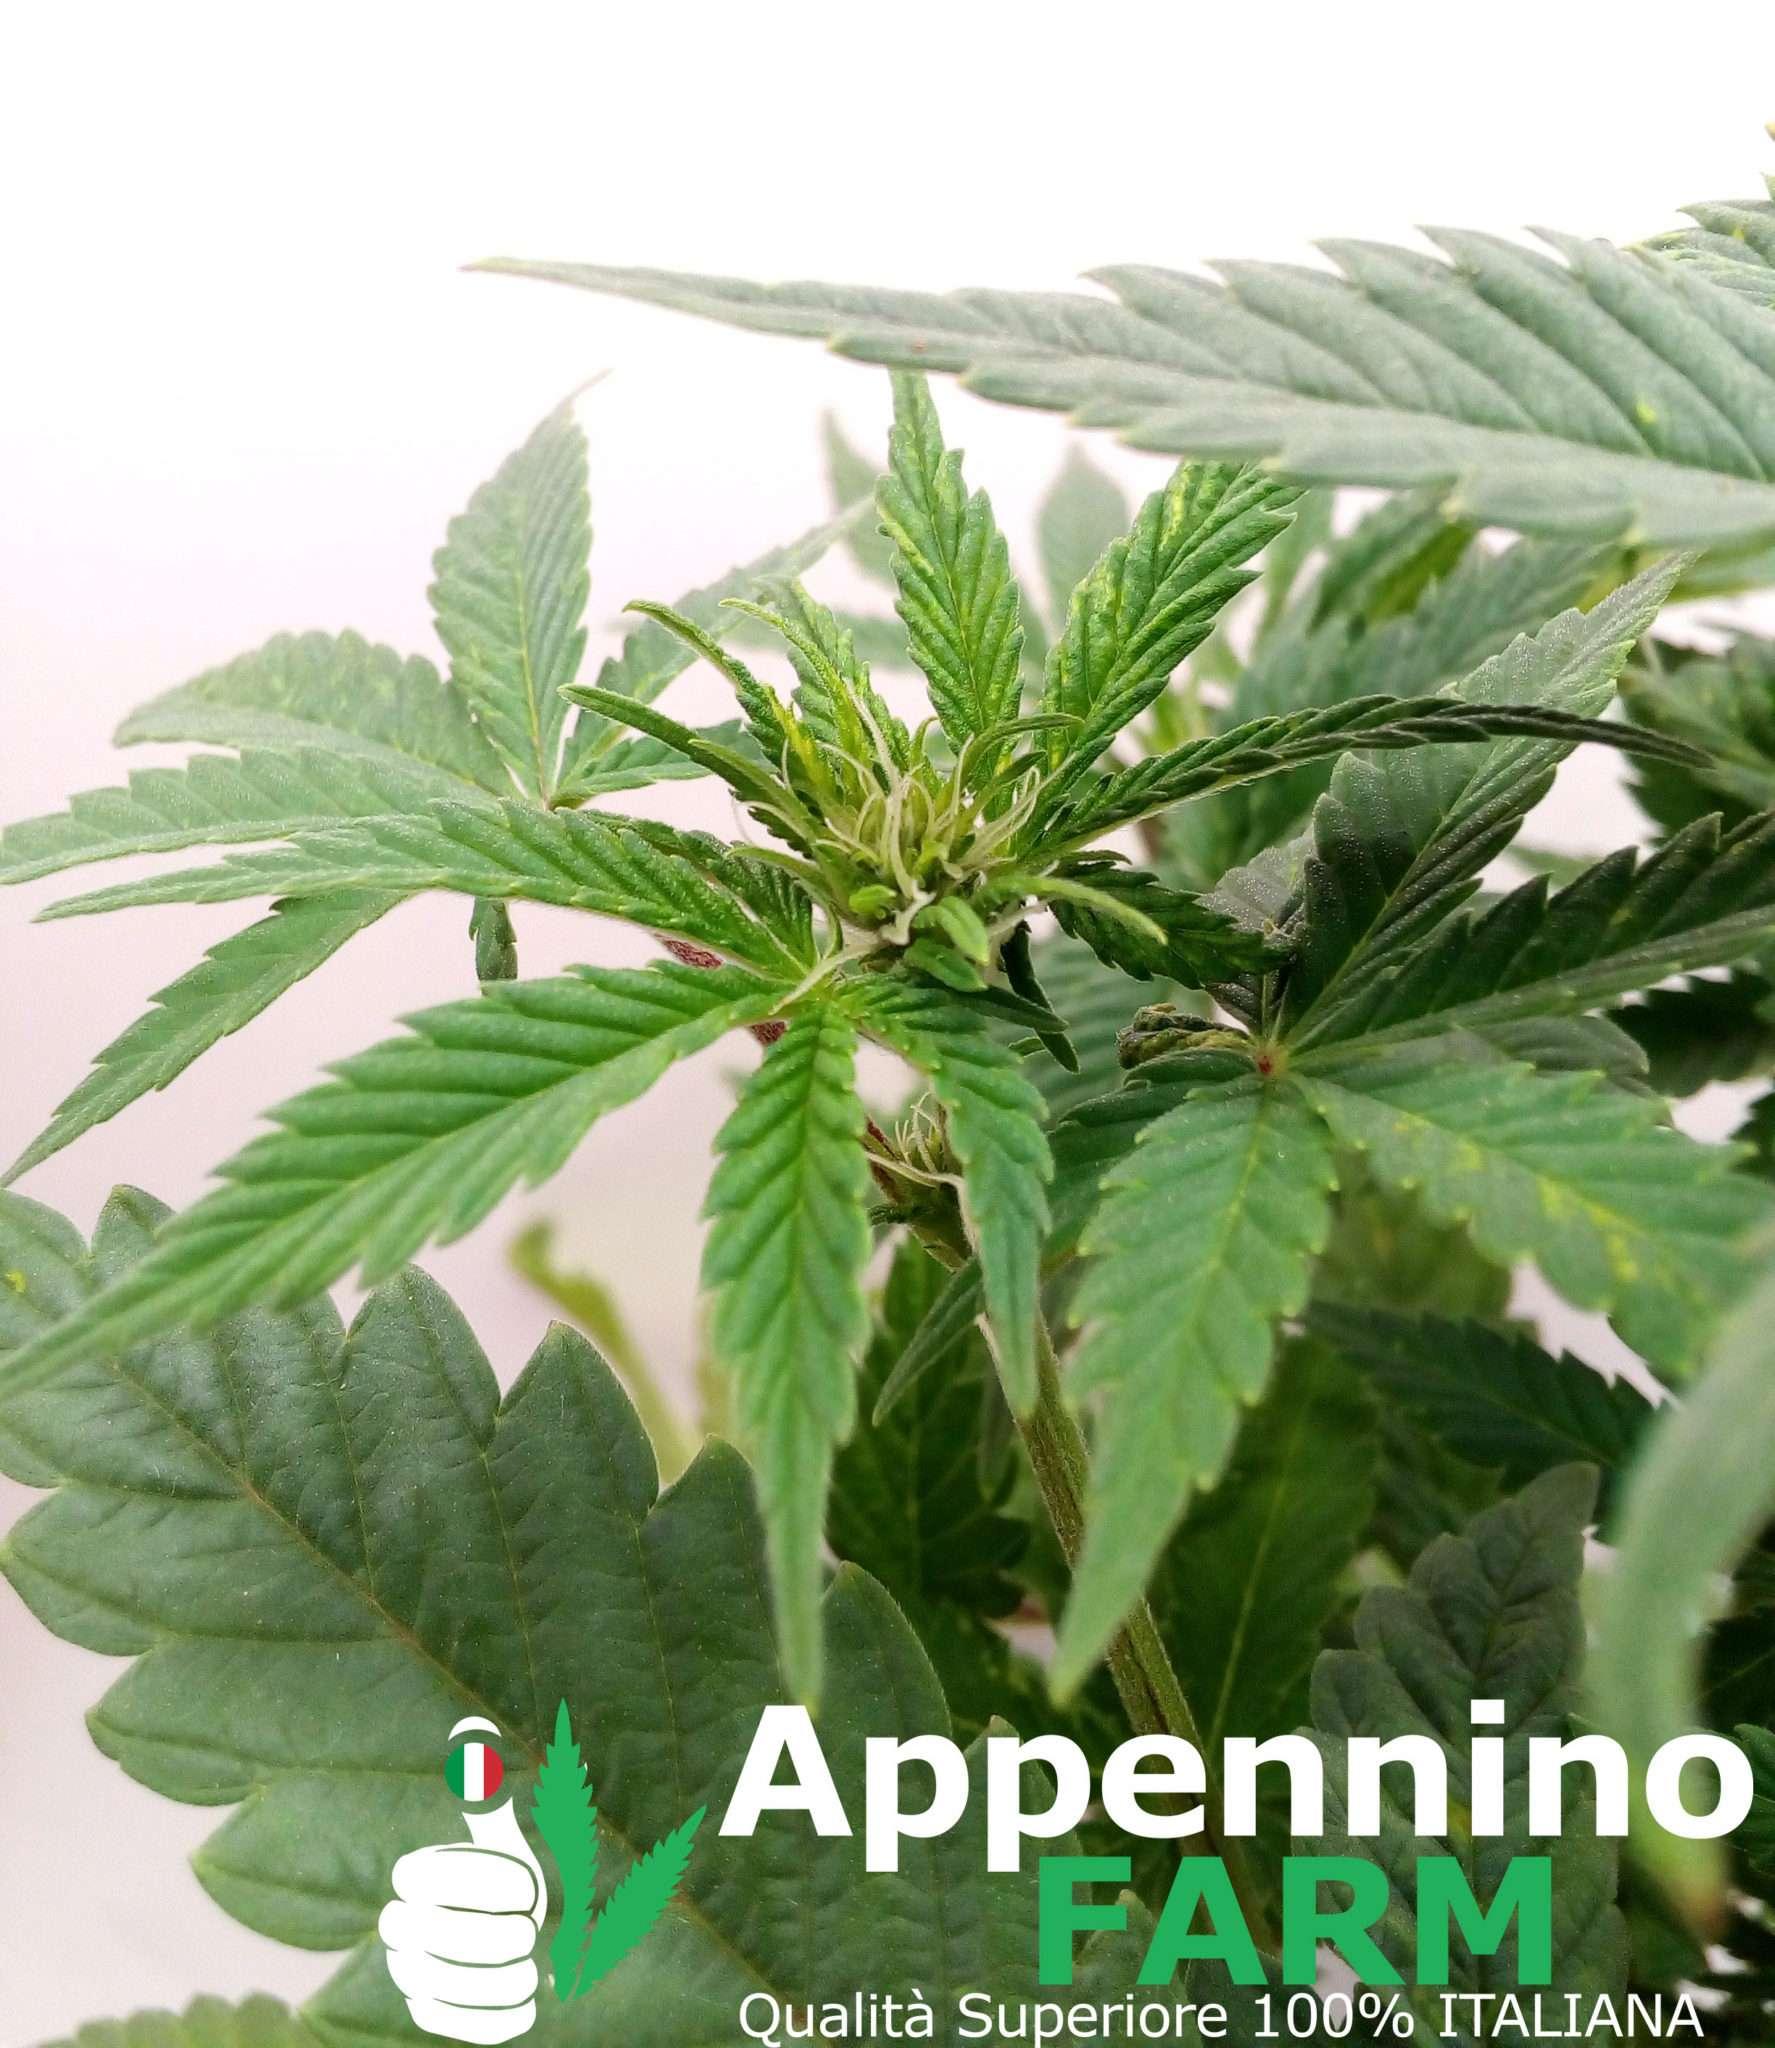 appenninofarm-fiore-pianta-femmina-indoor-cannabislight